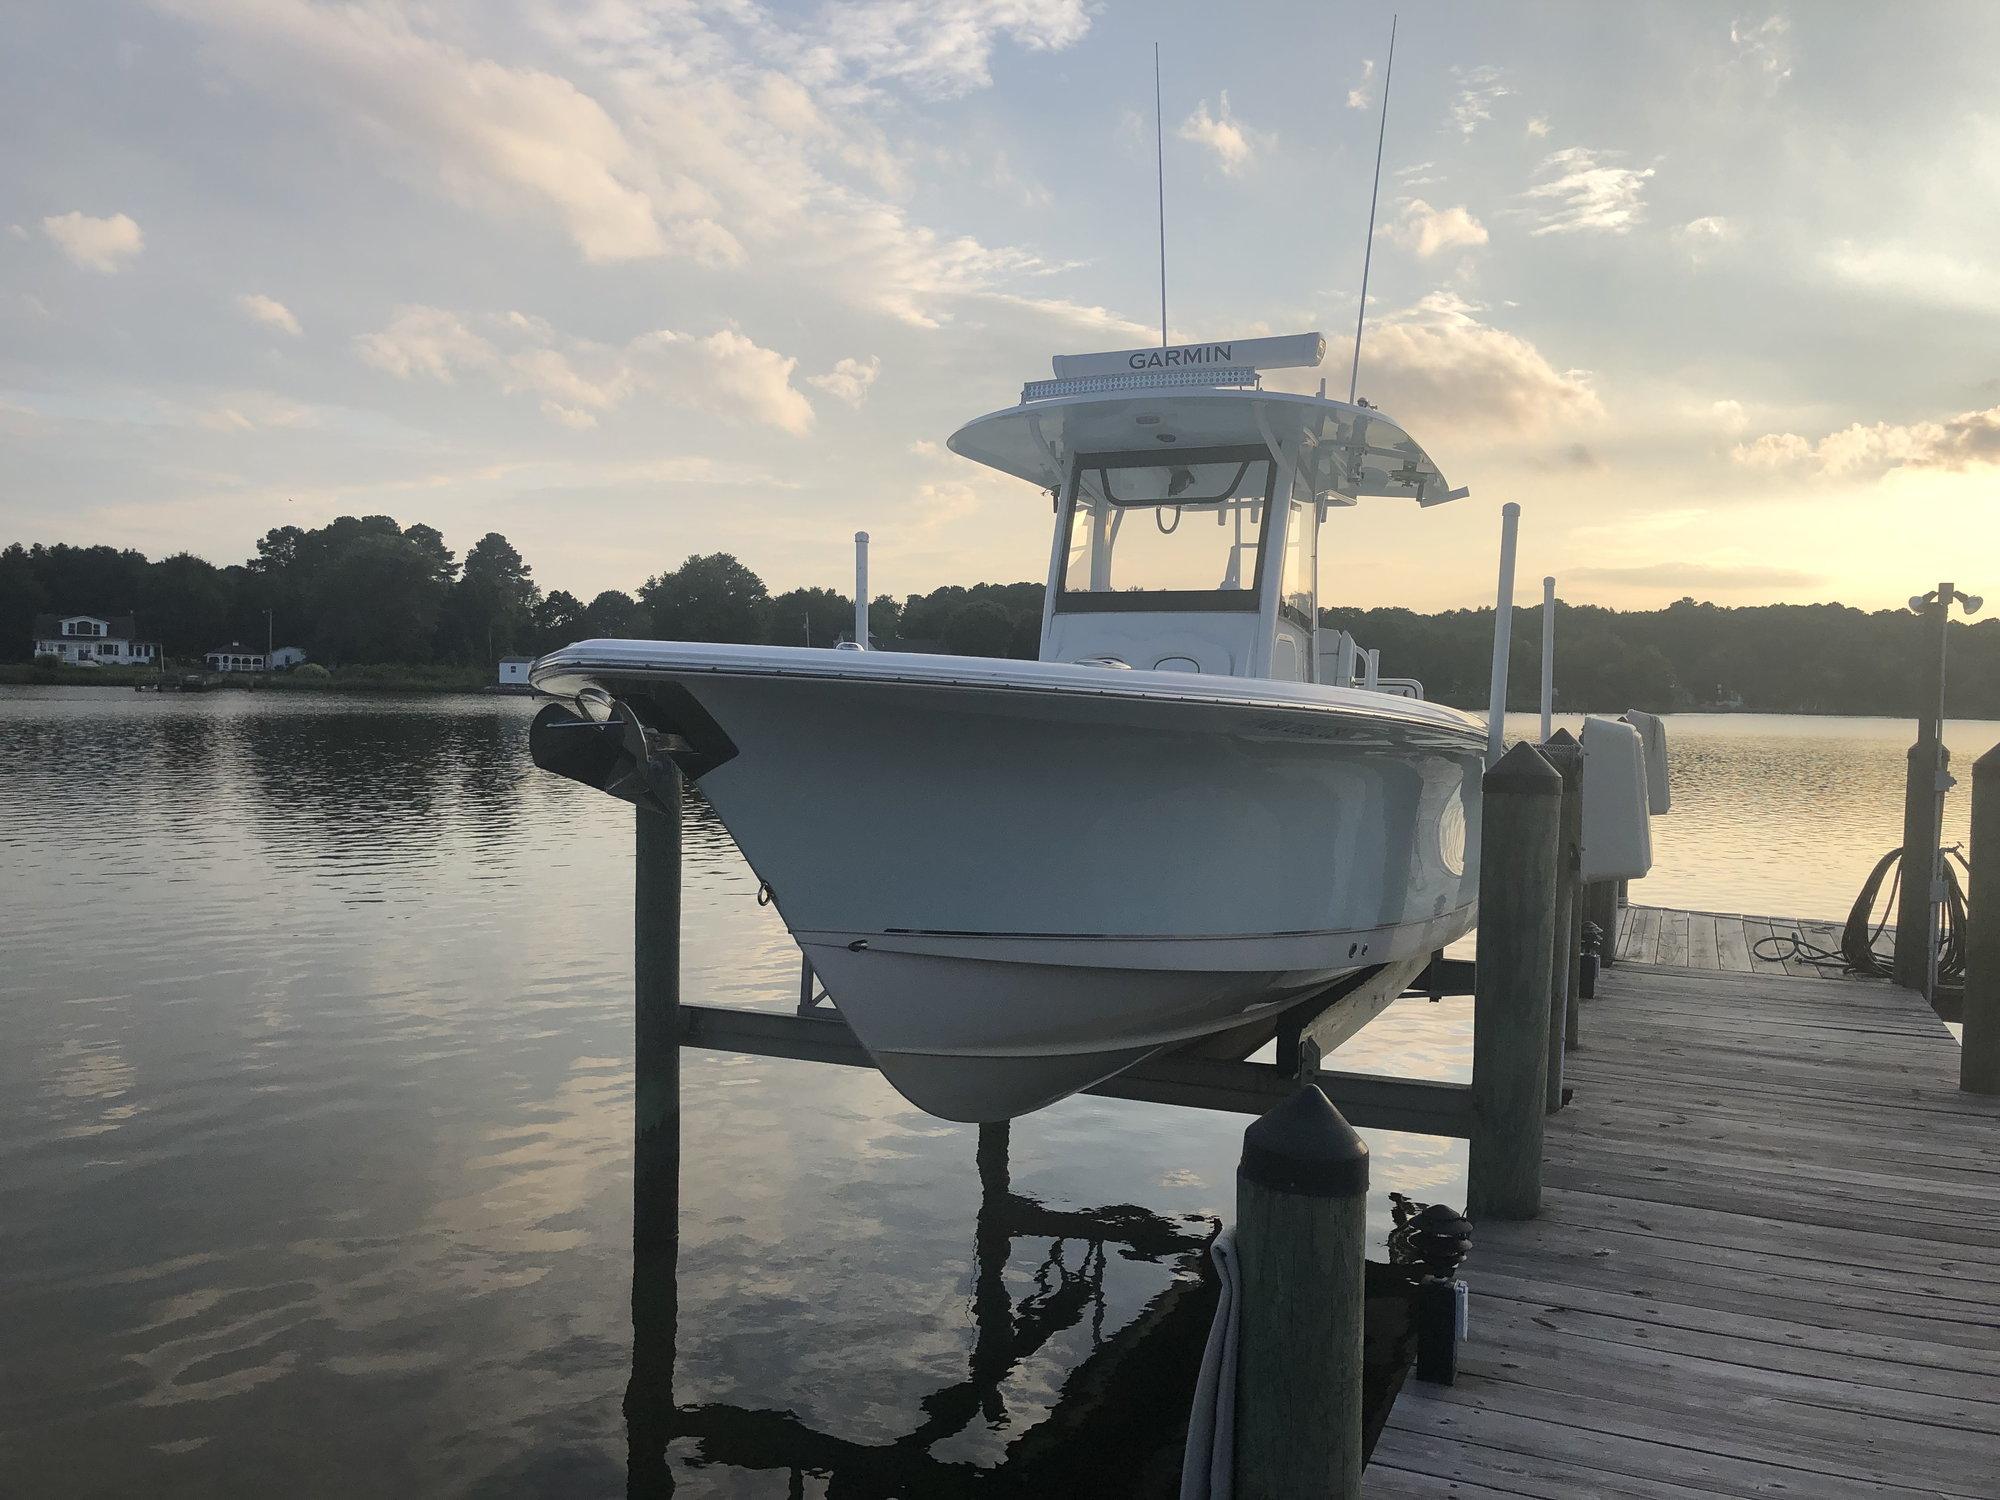 New PHOTOS Price DROP! 2017 Sea Hunt Gamefish 30 With